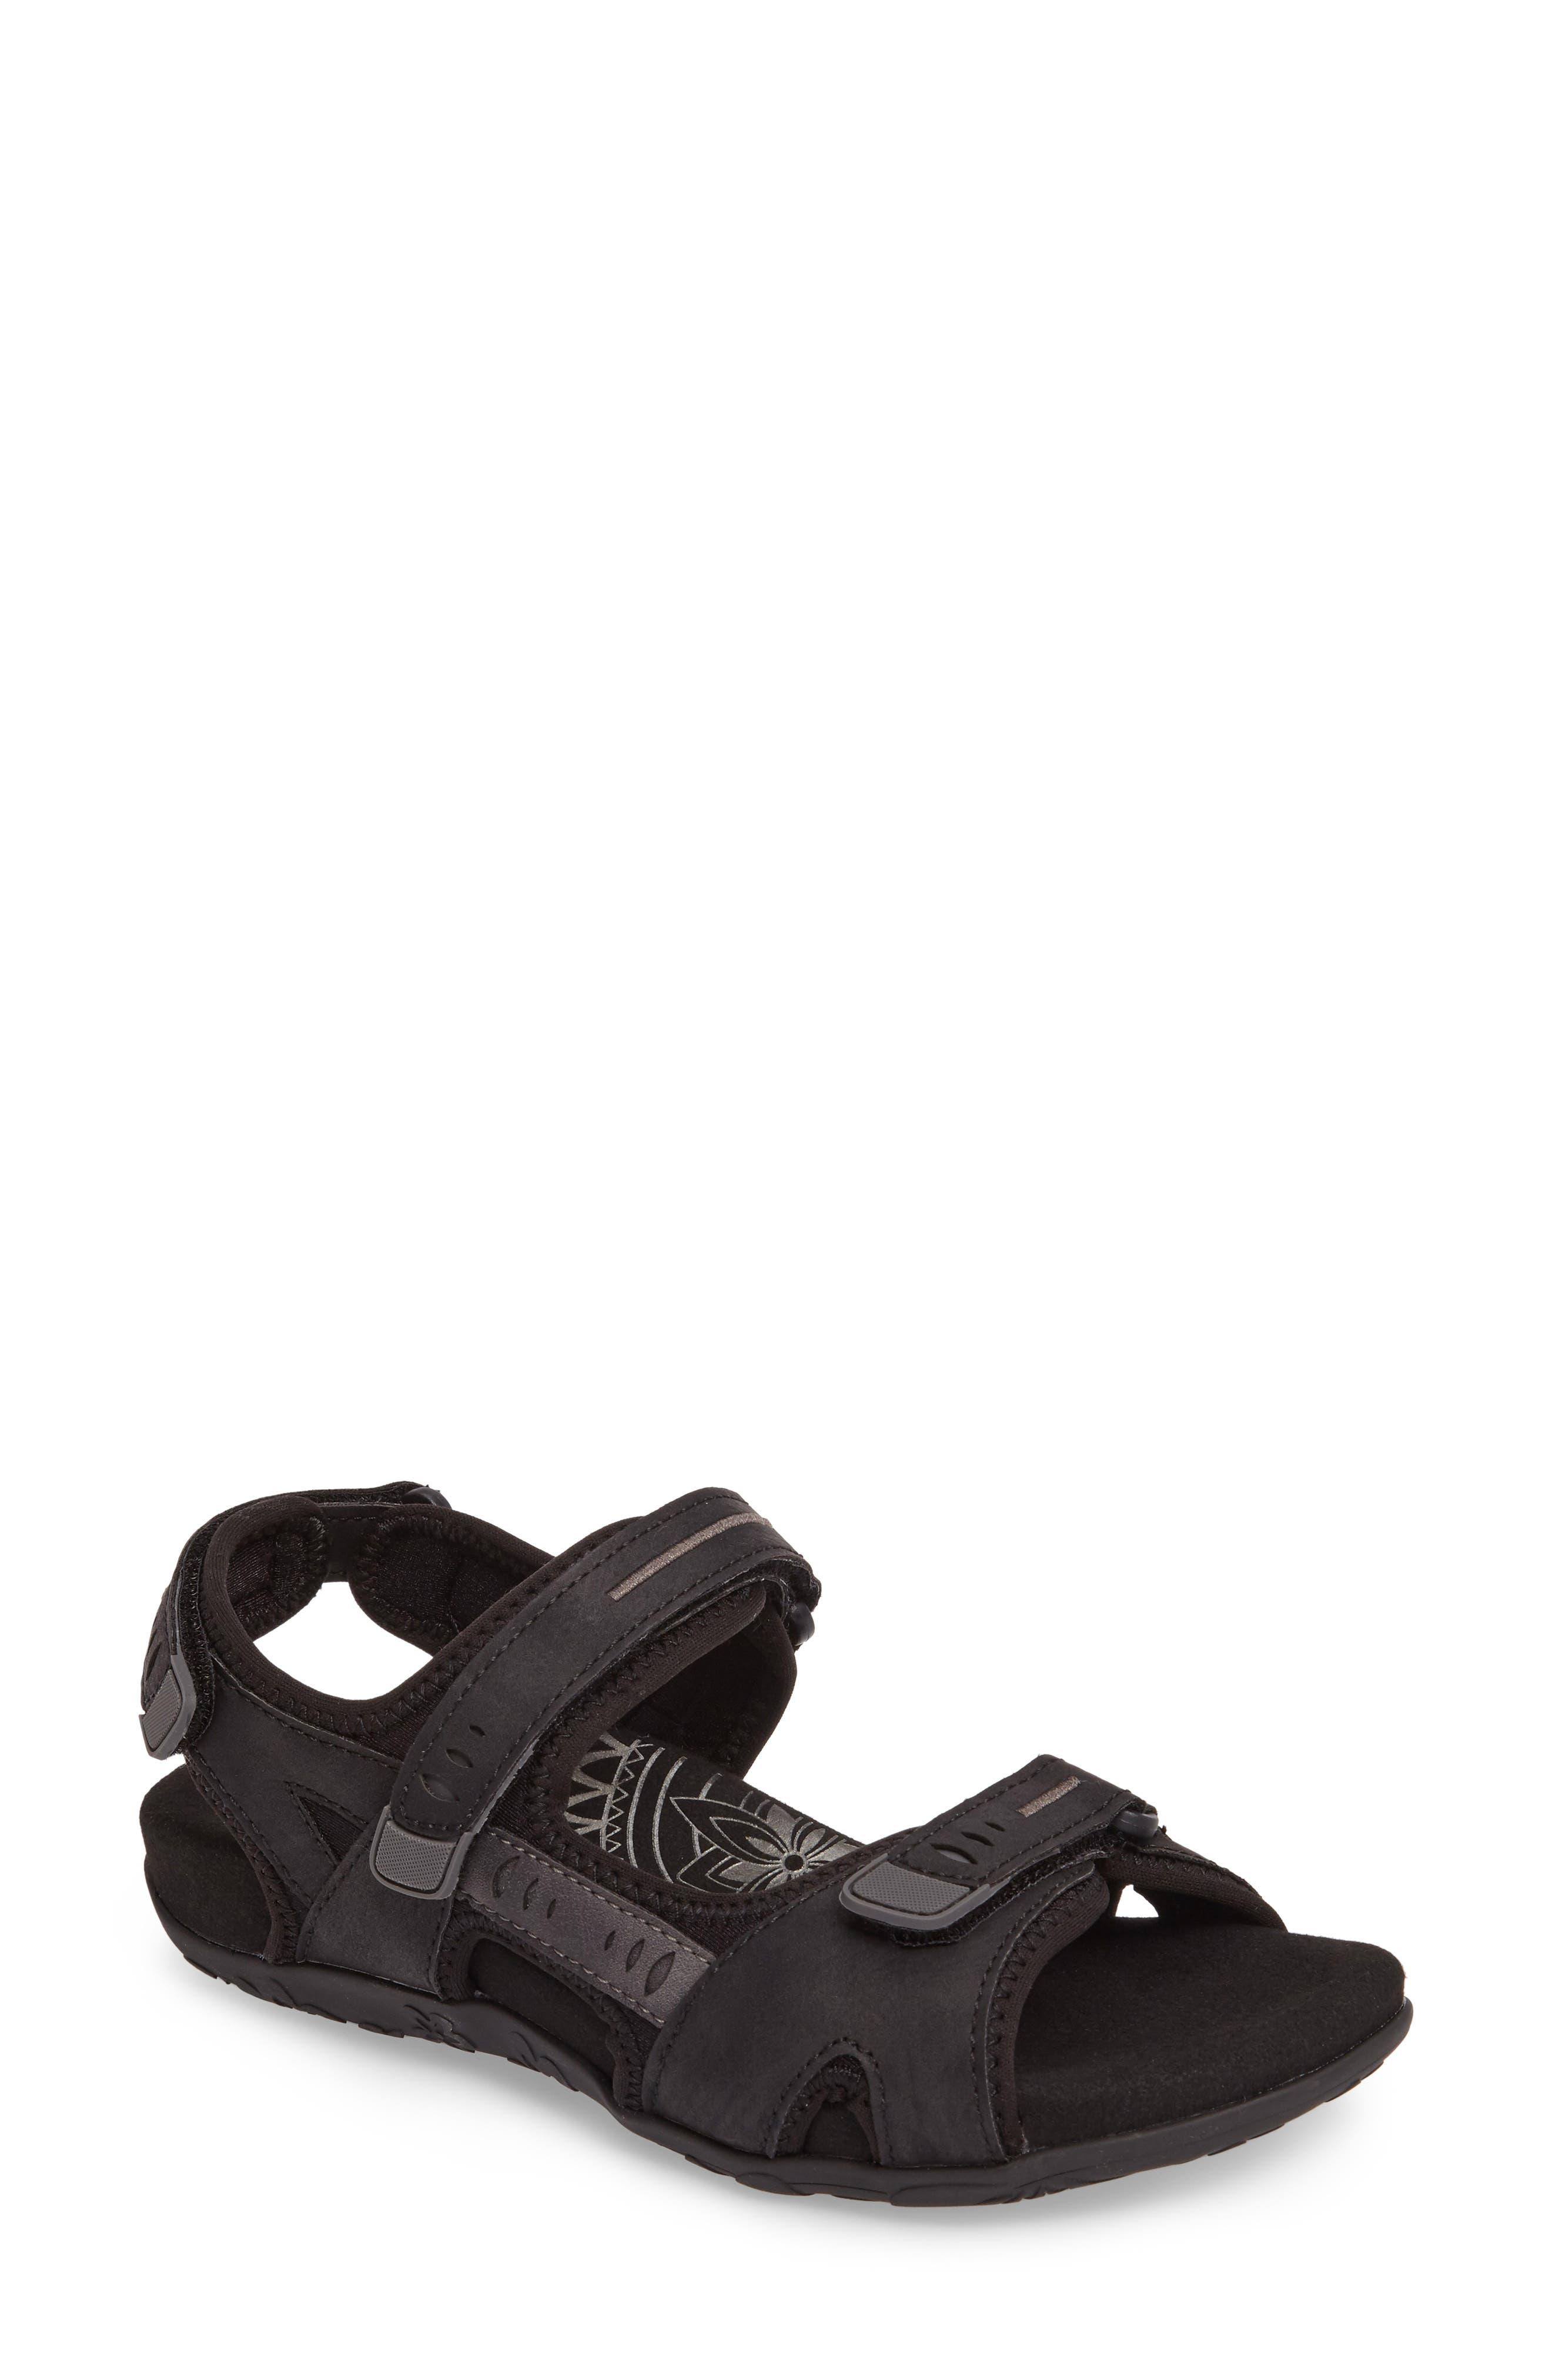 Bree Sport Sandal,                         Main,                         color, Black Fabric